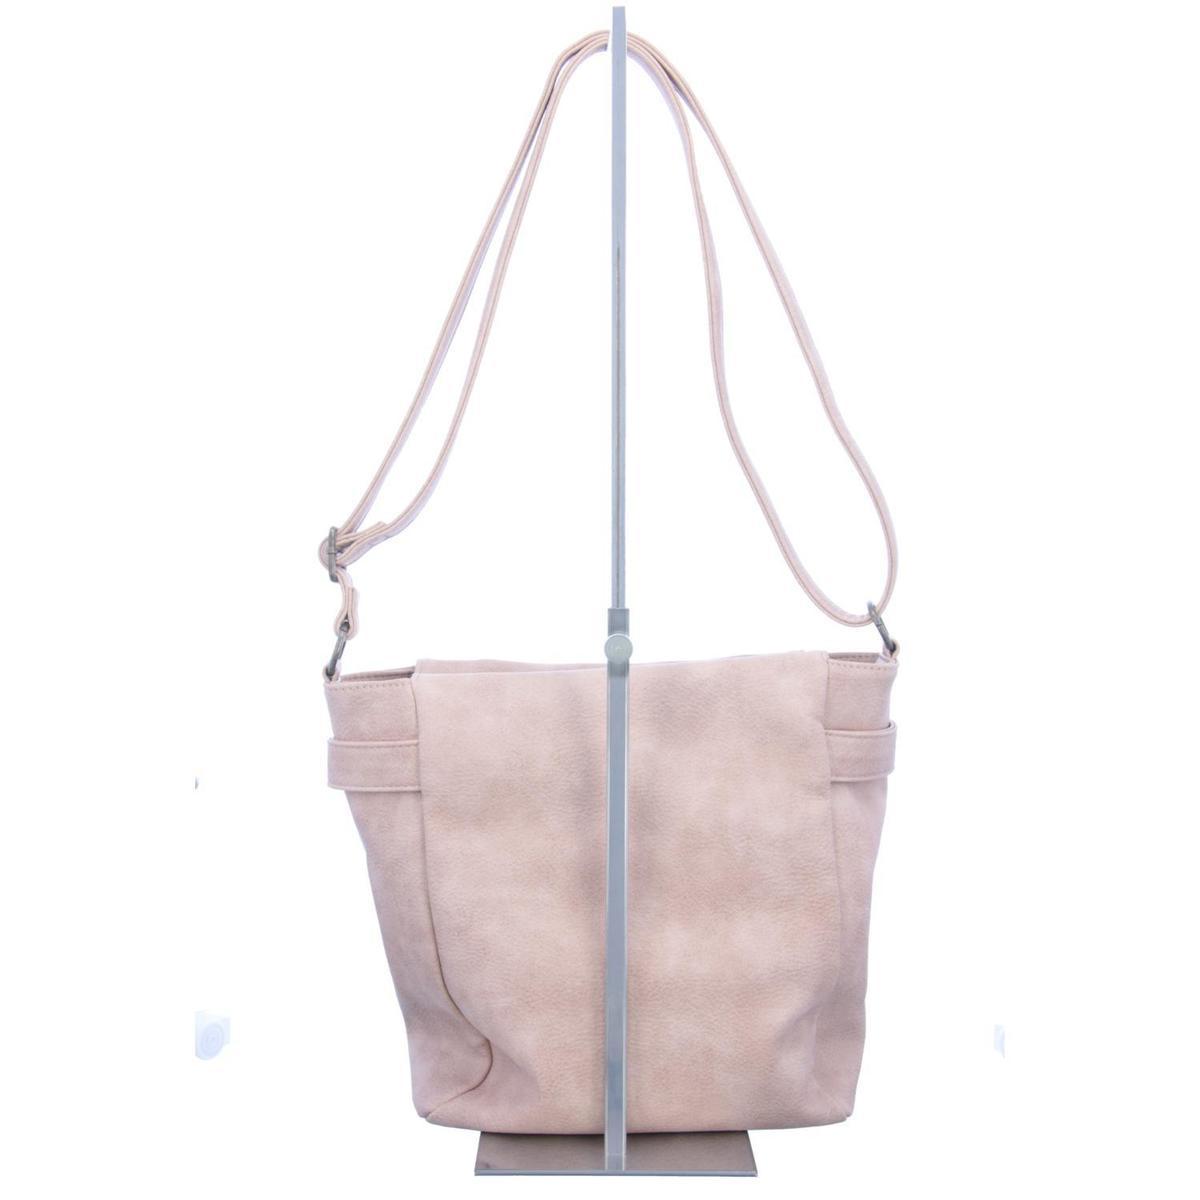 Fritzi aus Preußen Handtasche Accessoires Taschen Jella Caribou-0179 xE3Eq